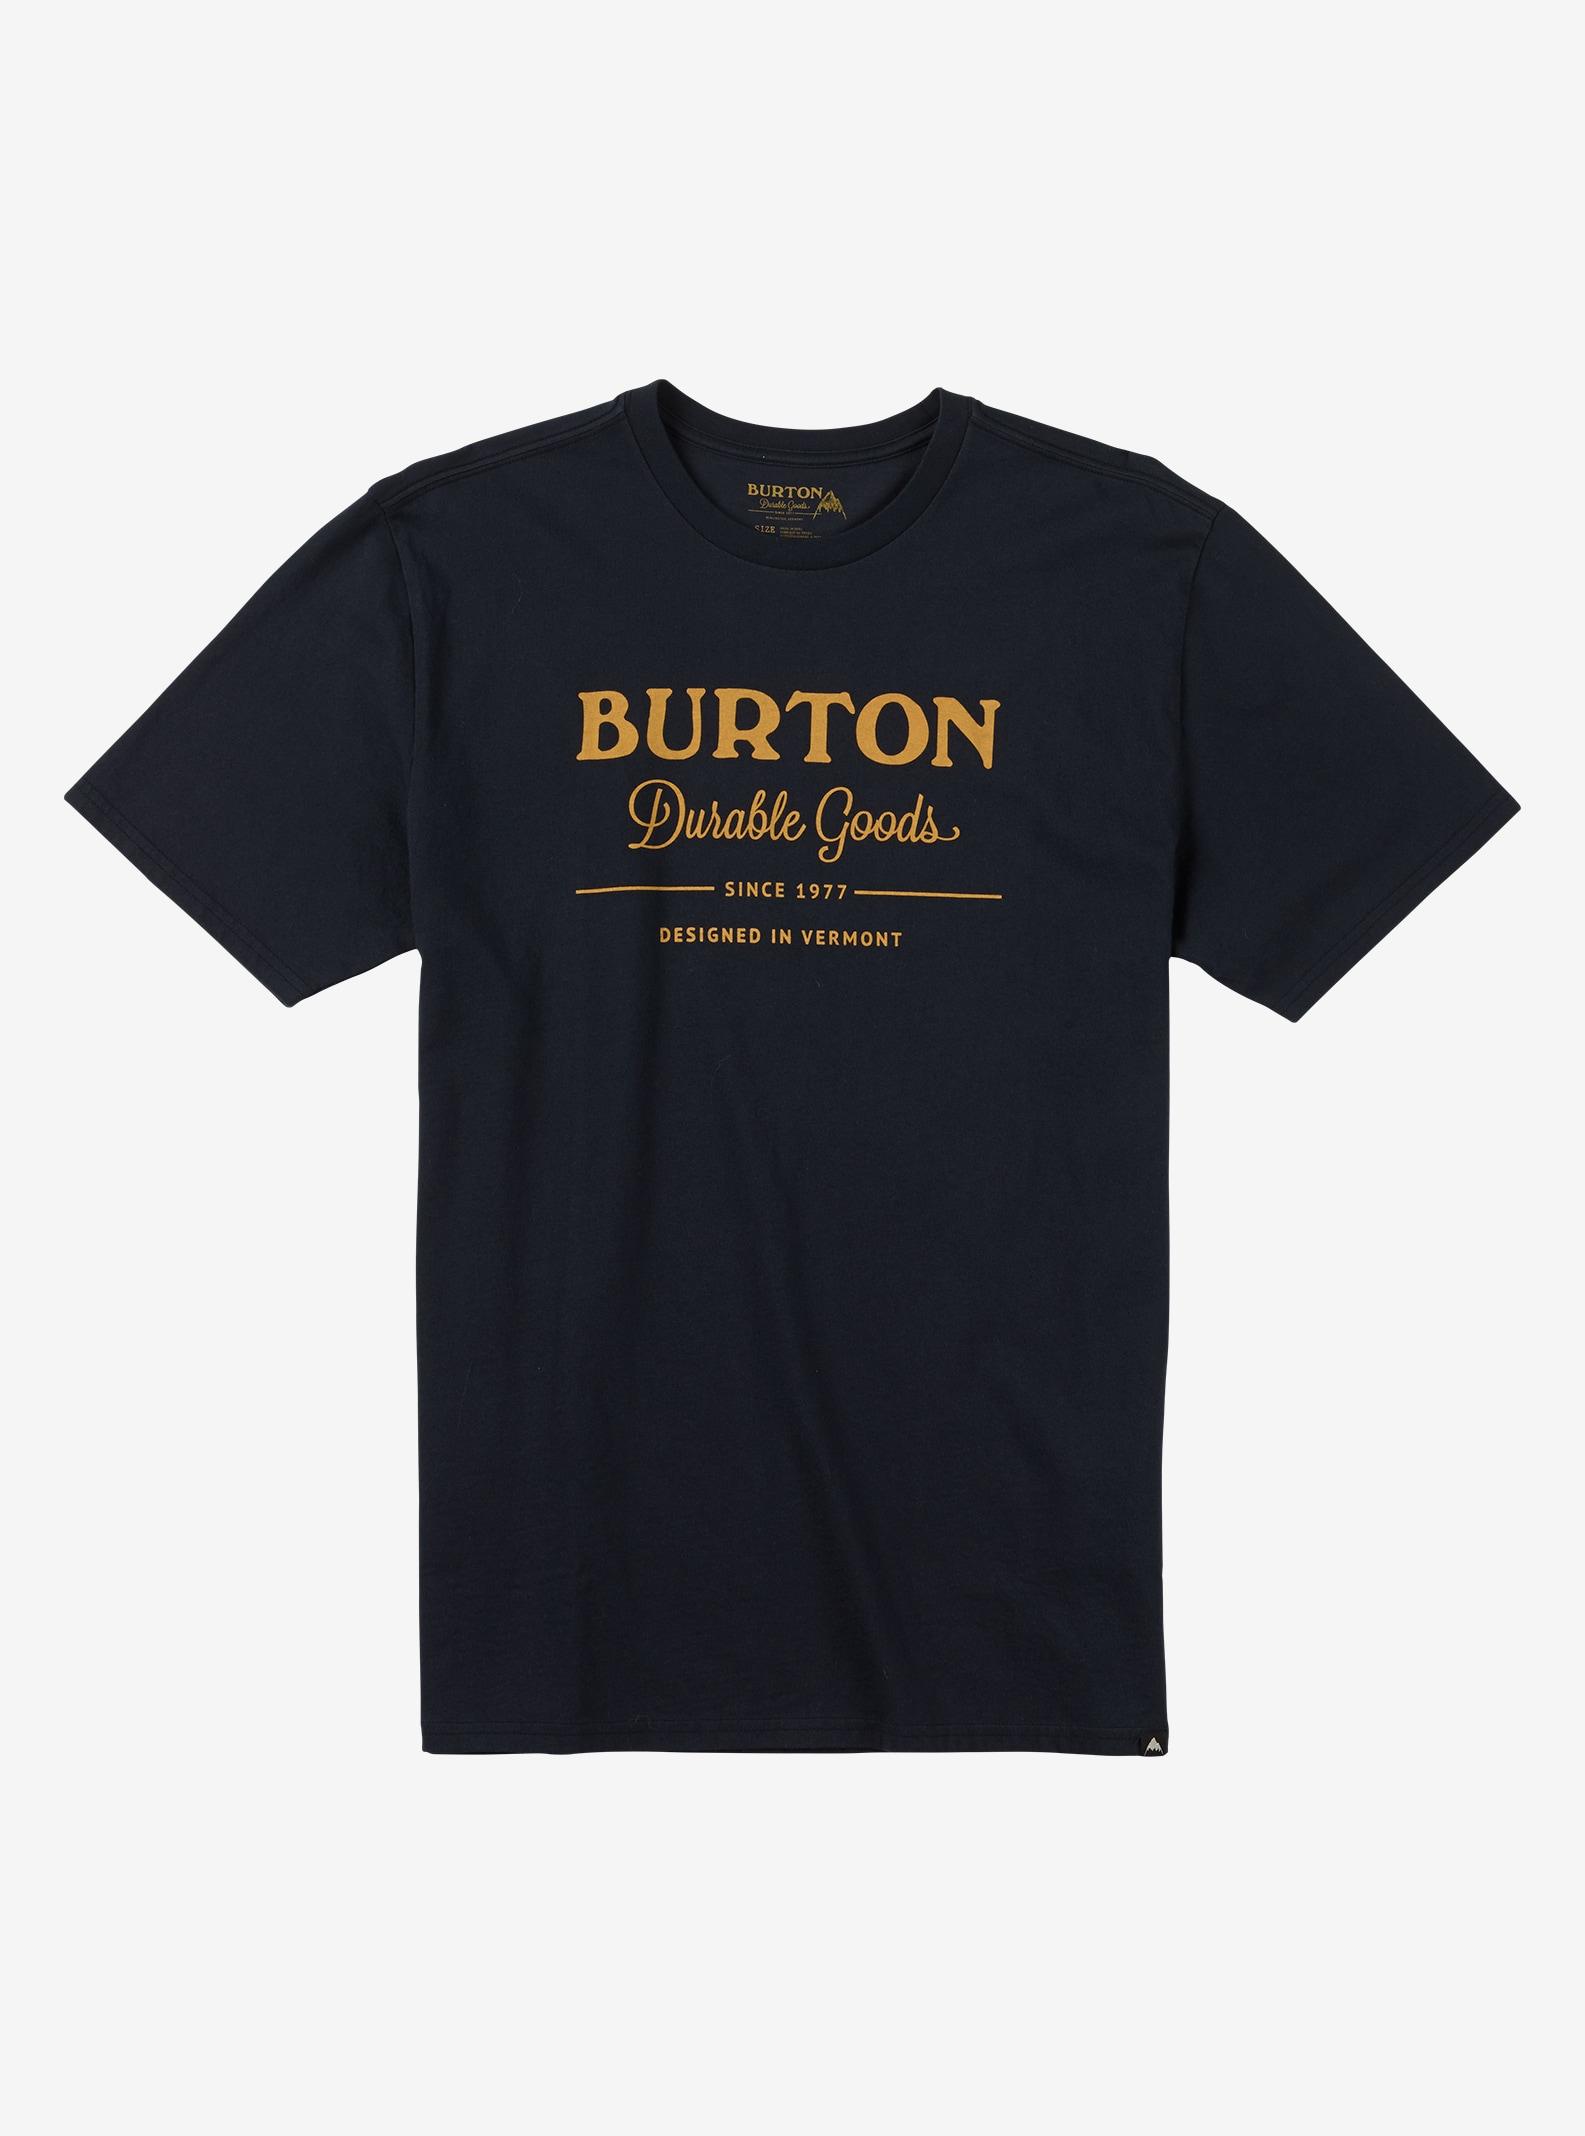 Burton Durable Goods Short Sleeve T Shirt shown in True Black